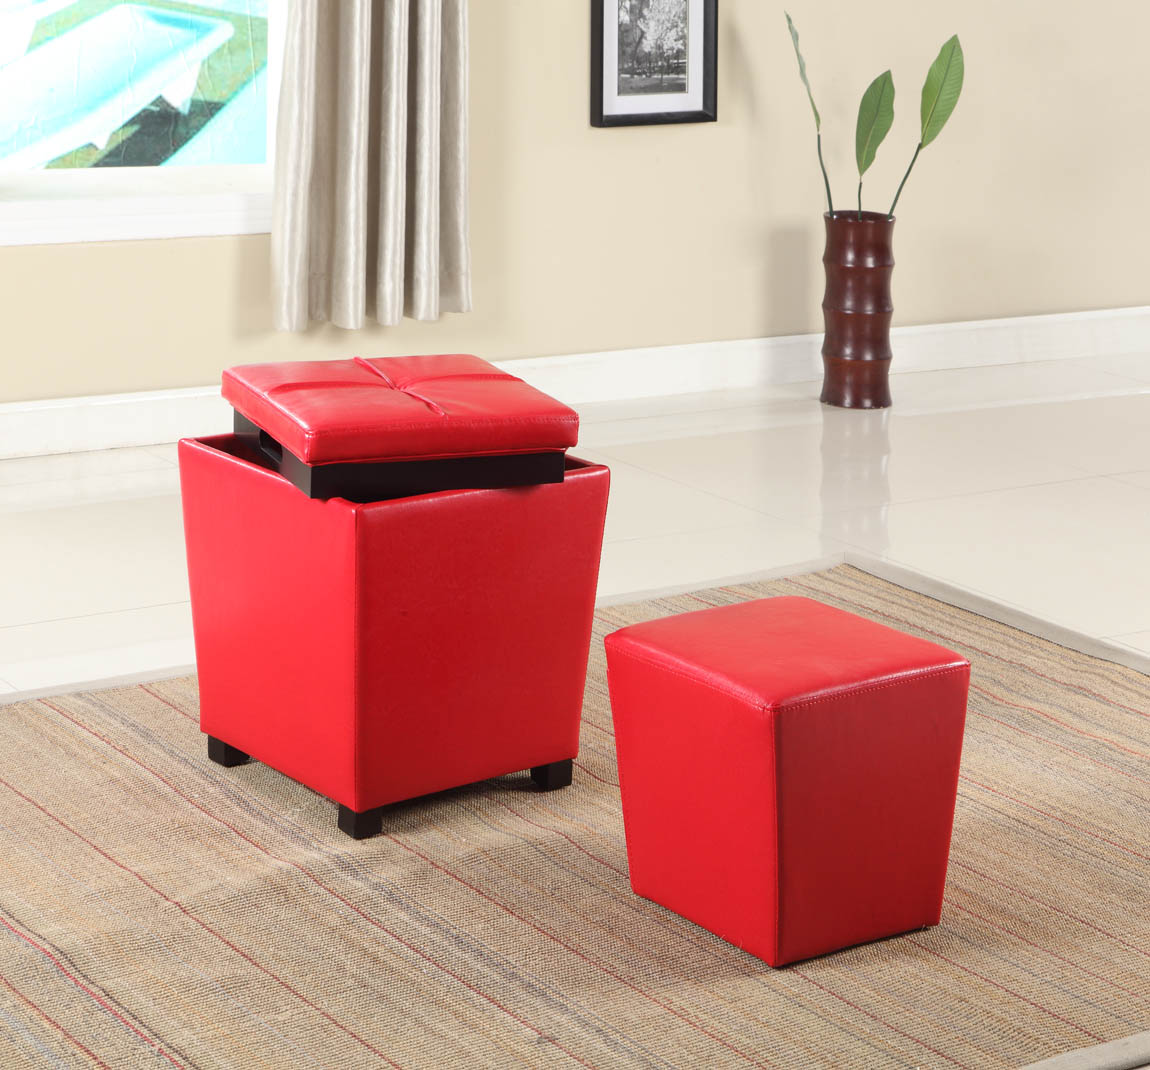 Furnituremaxx.com Fun Color 2 in 1 Storage Ottoman w/ Stool Bloody Red